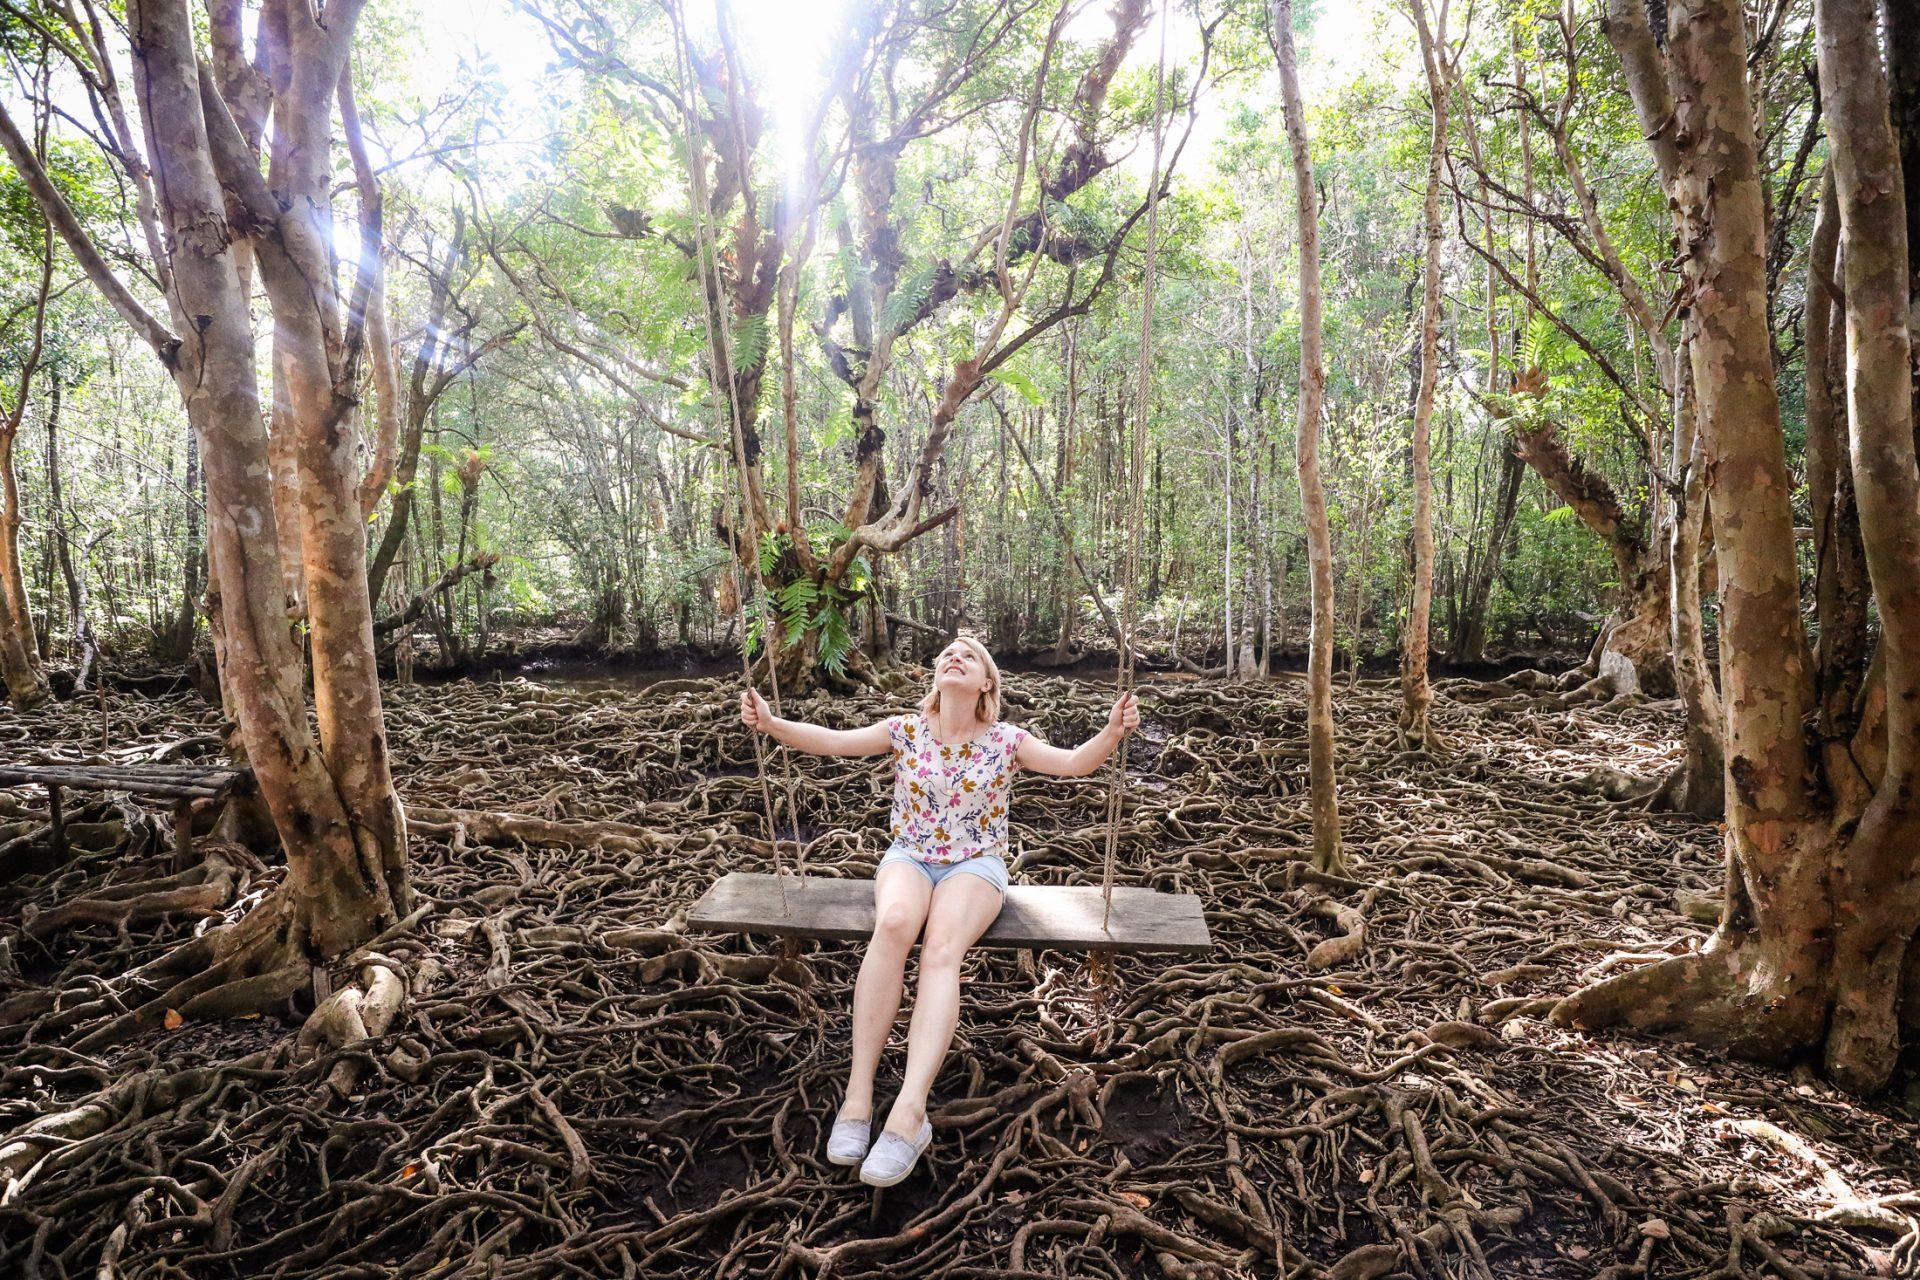 Mangrove forest, eastern Thailand